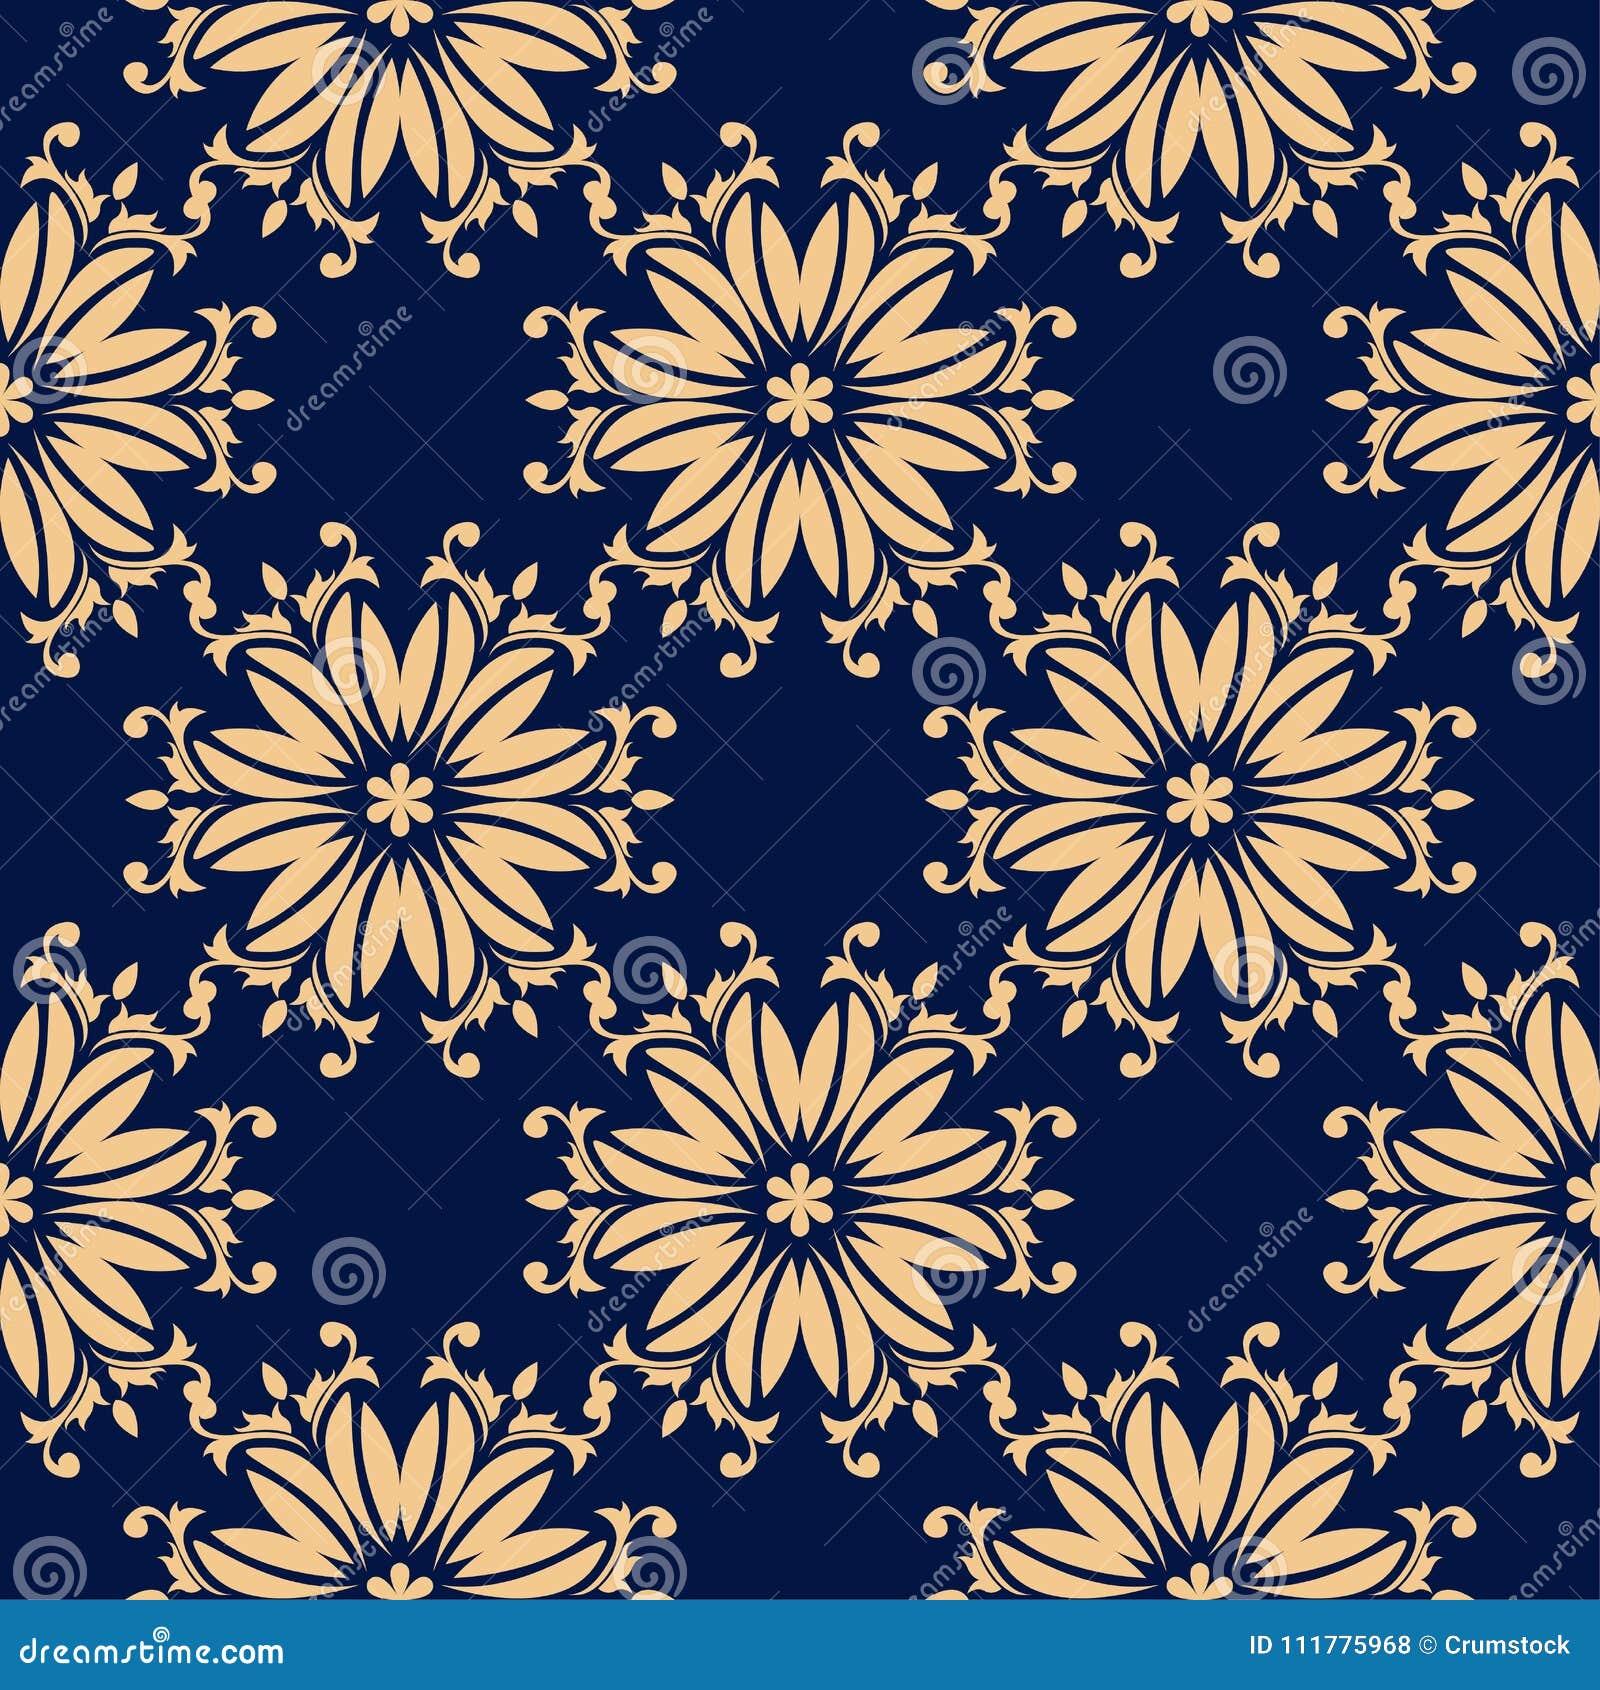 Golden flowers on blue background. Ornamental seamless pattern